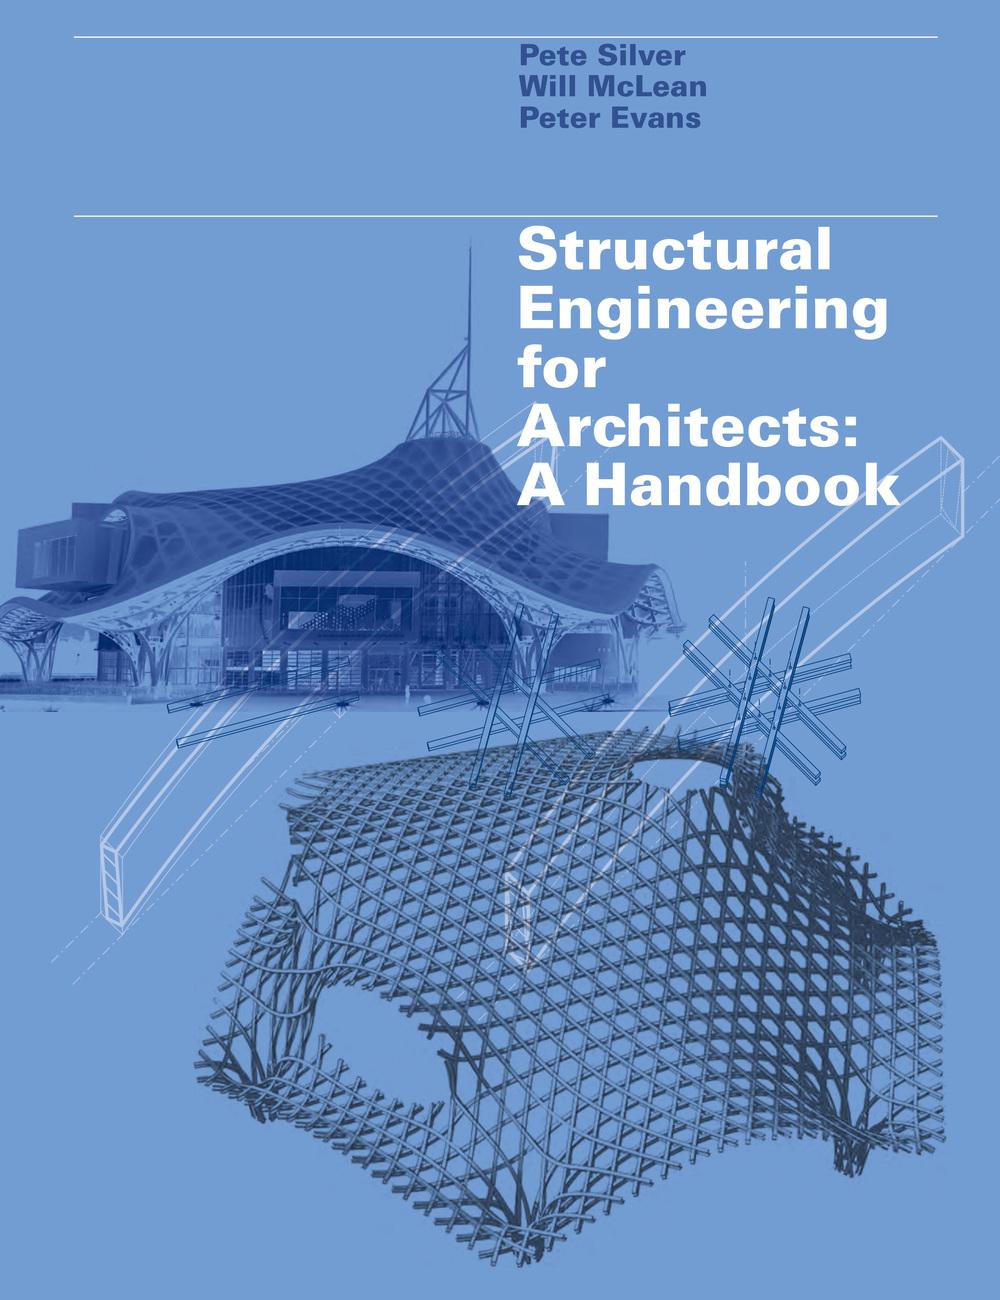 DuBois Santa Fe Structural Engineering Cover.jpg